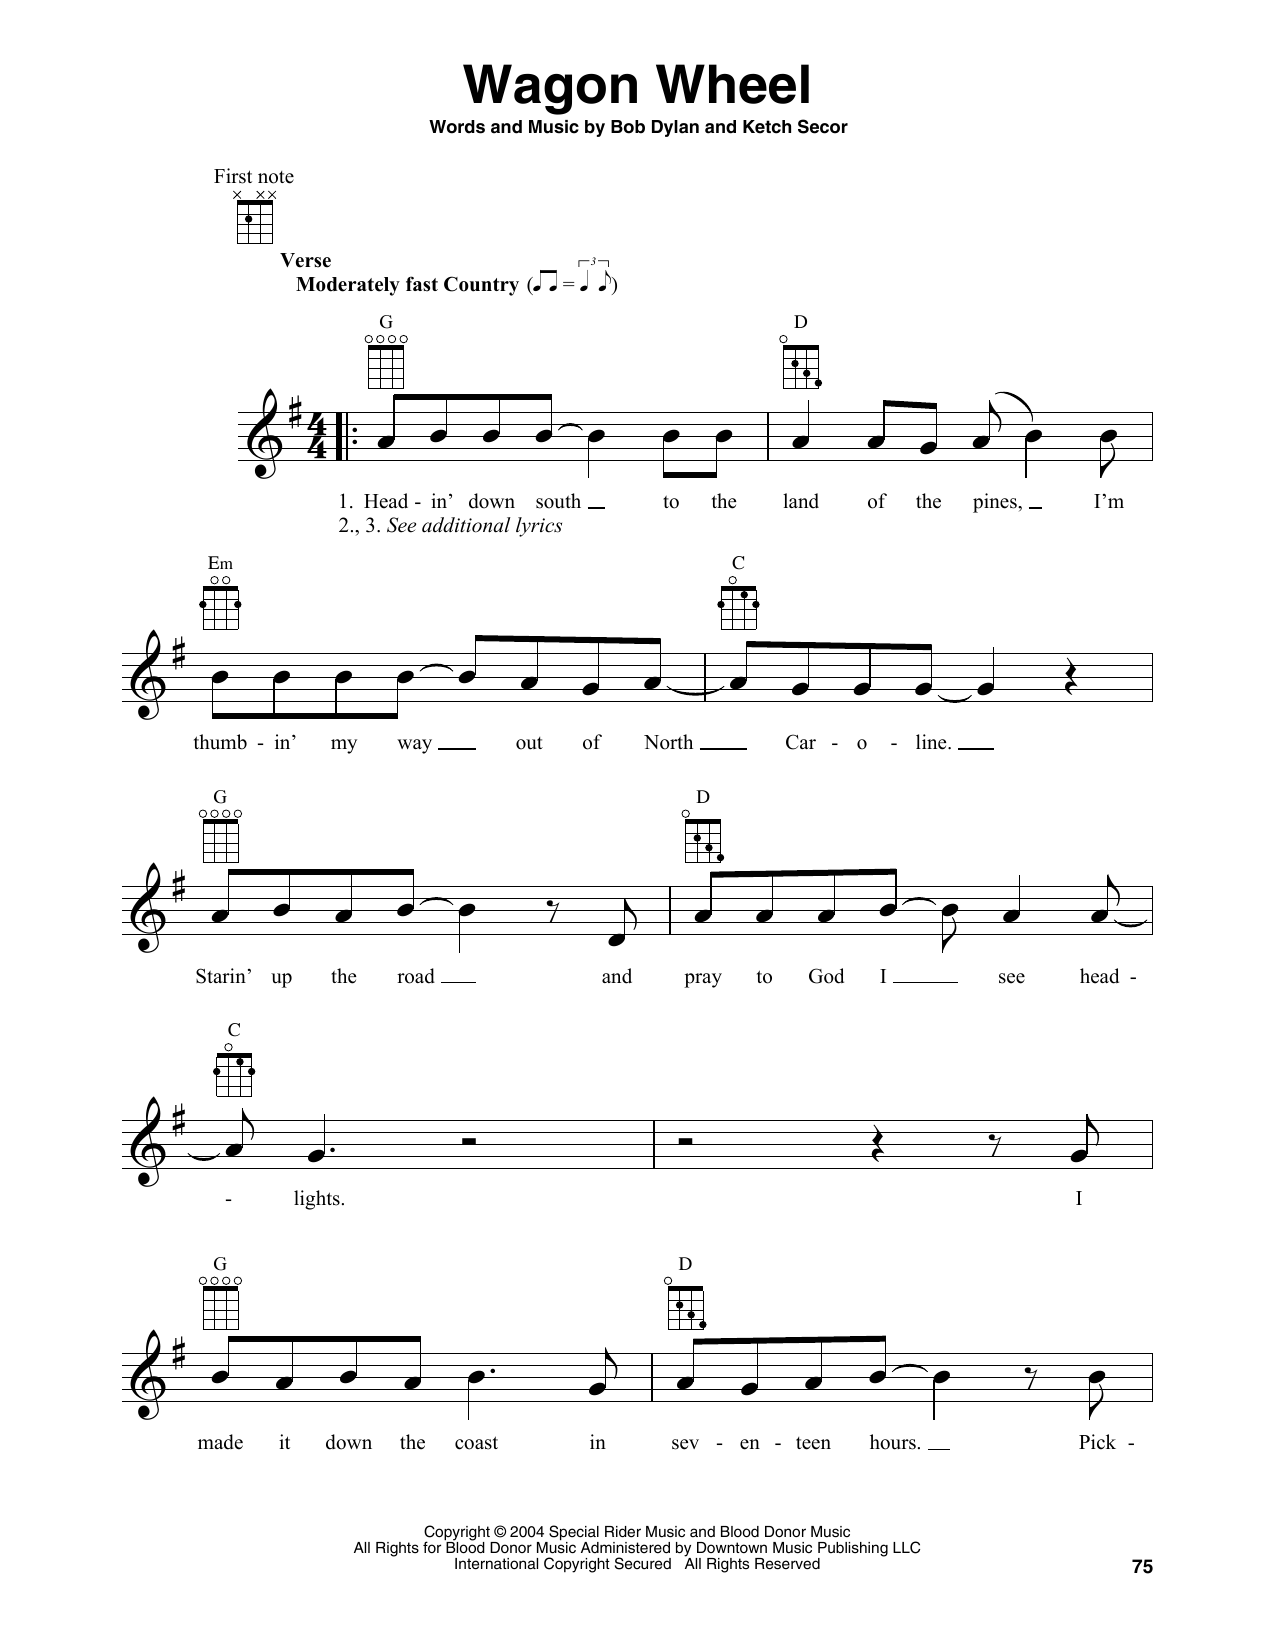 Boby Dylan 'Wagon Wheel' Sheet Music Notes, Chords | Download Printable  Banjo Tab - SKU: 414956